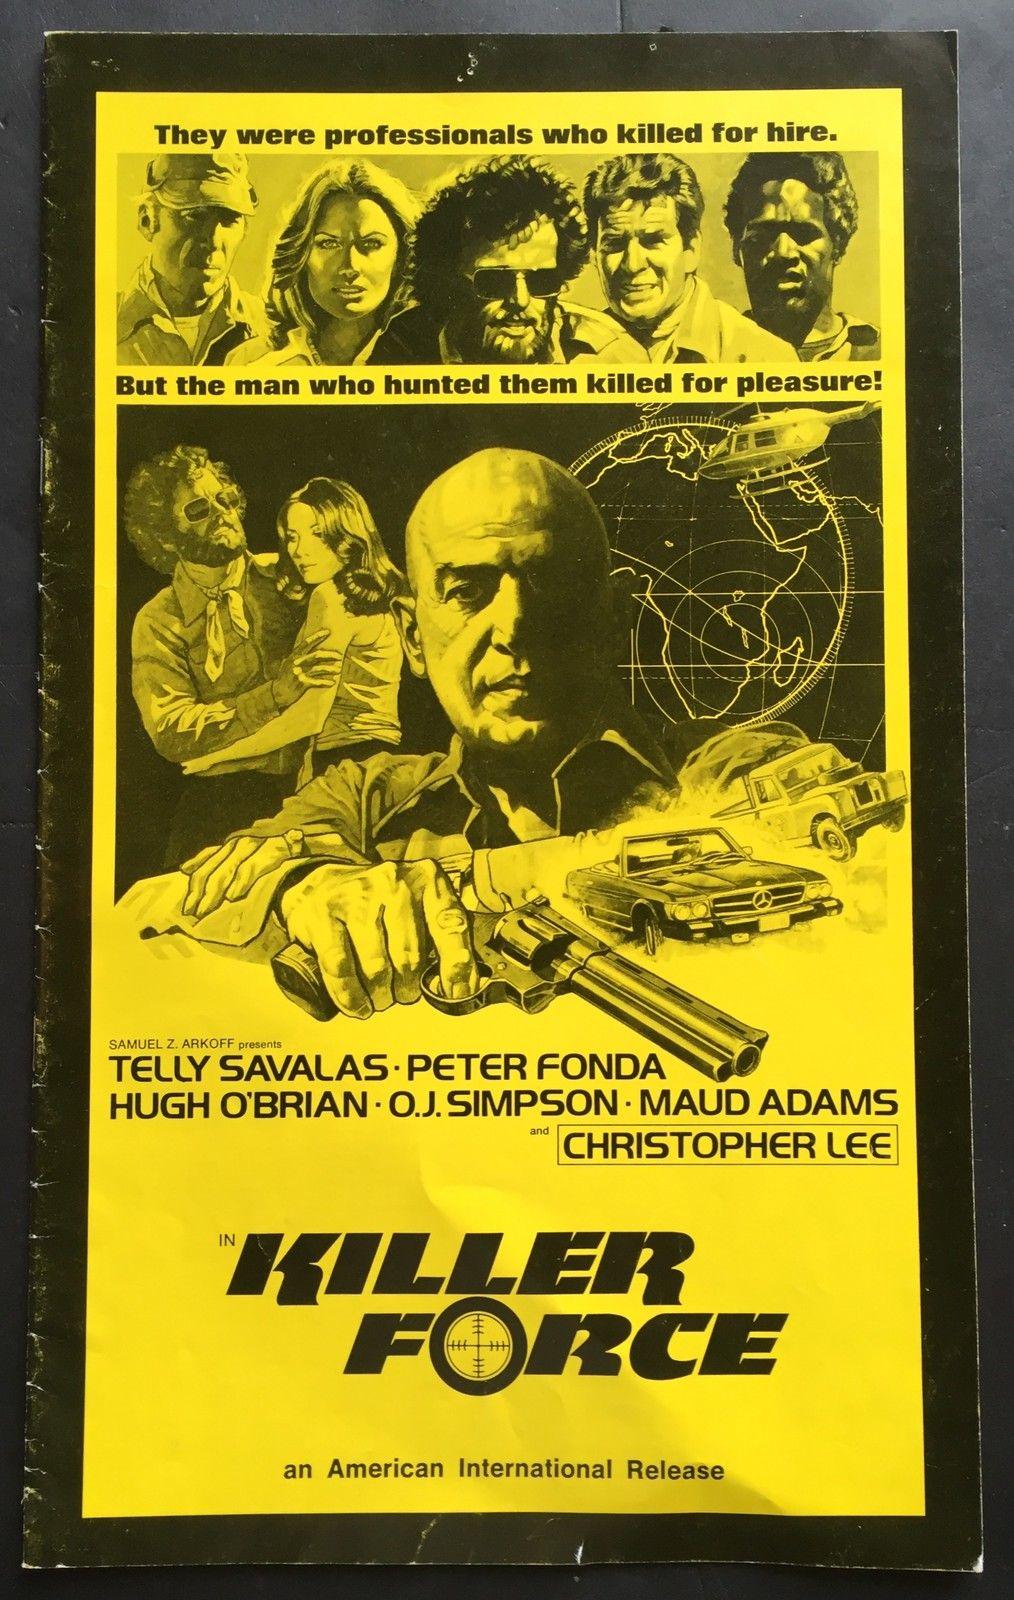 Oj  Simpson bills hof  KILLER PORCE Original 1976 movie Theater Pressbook AD nm